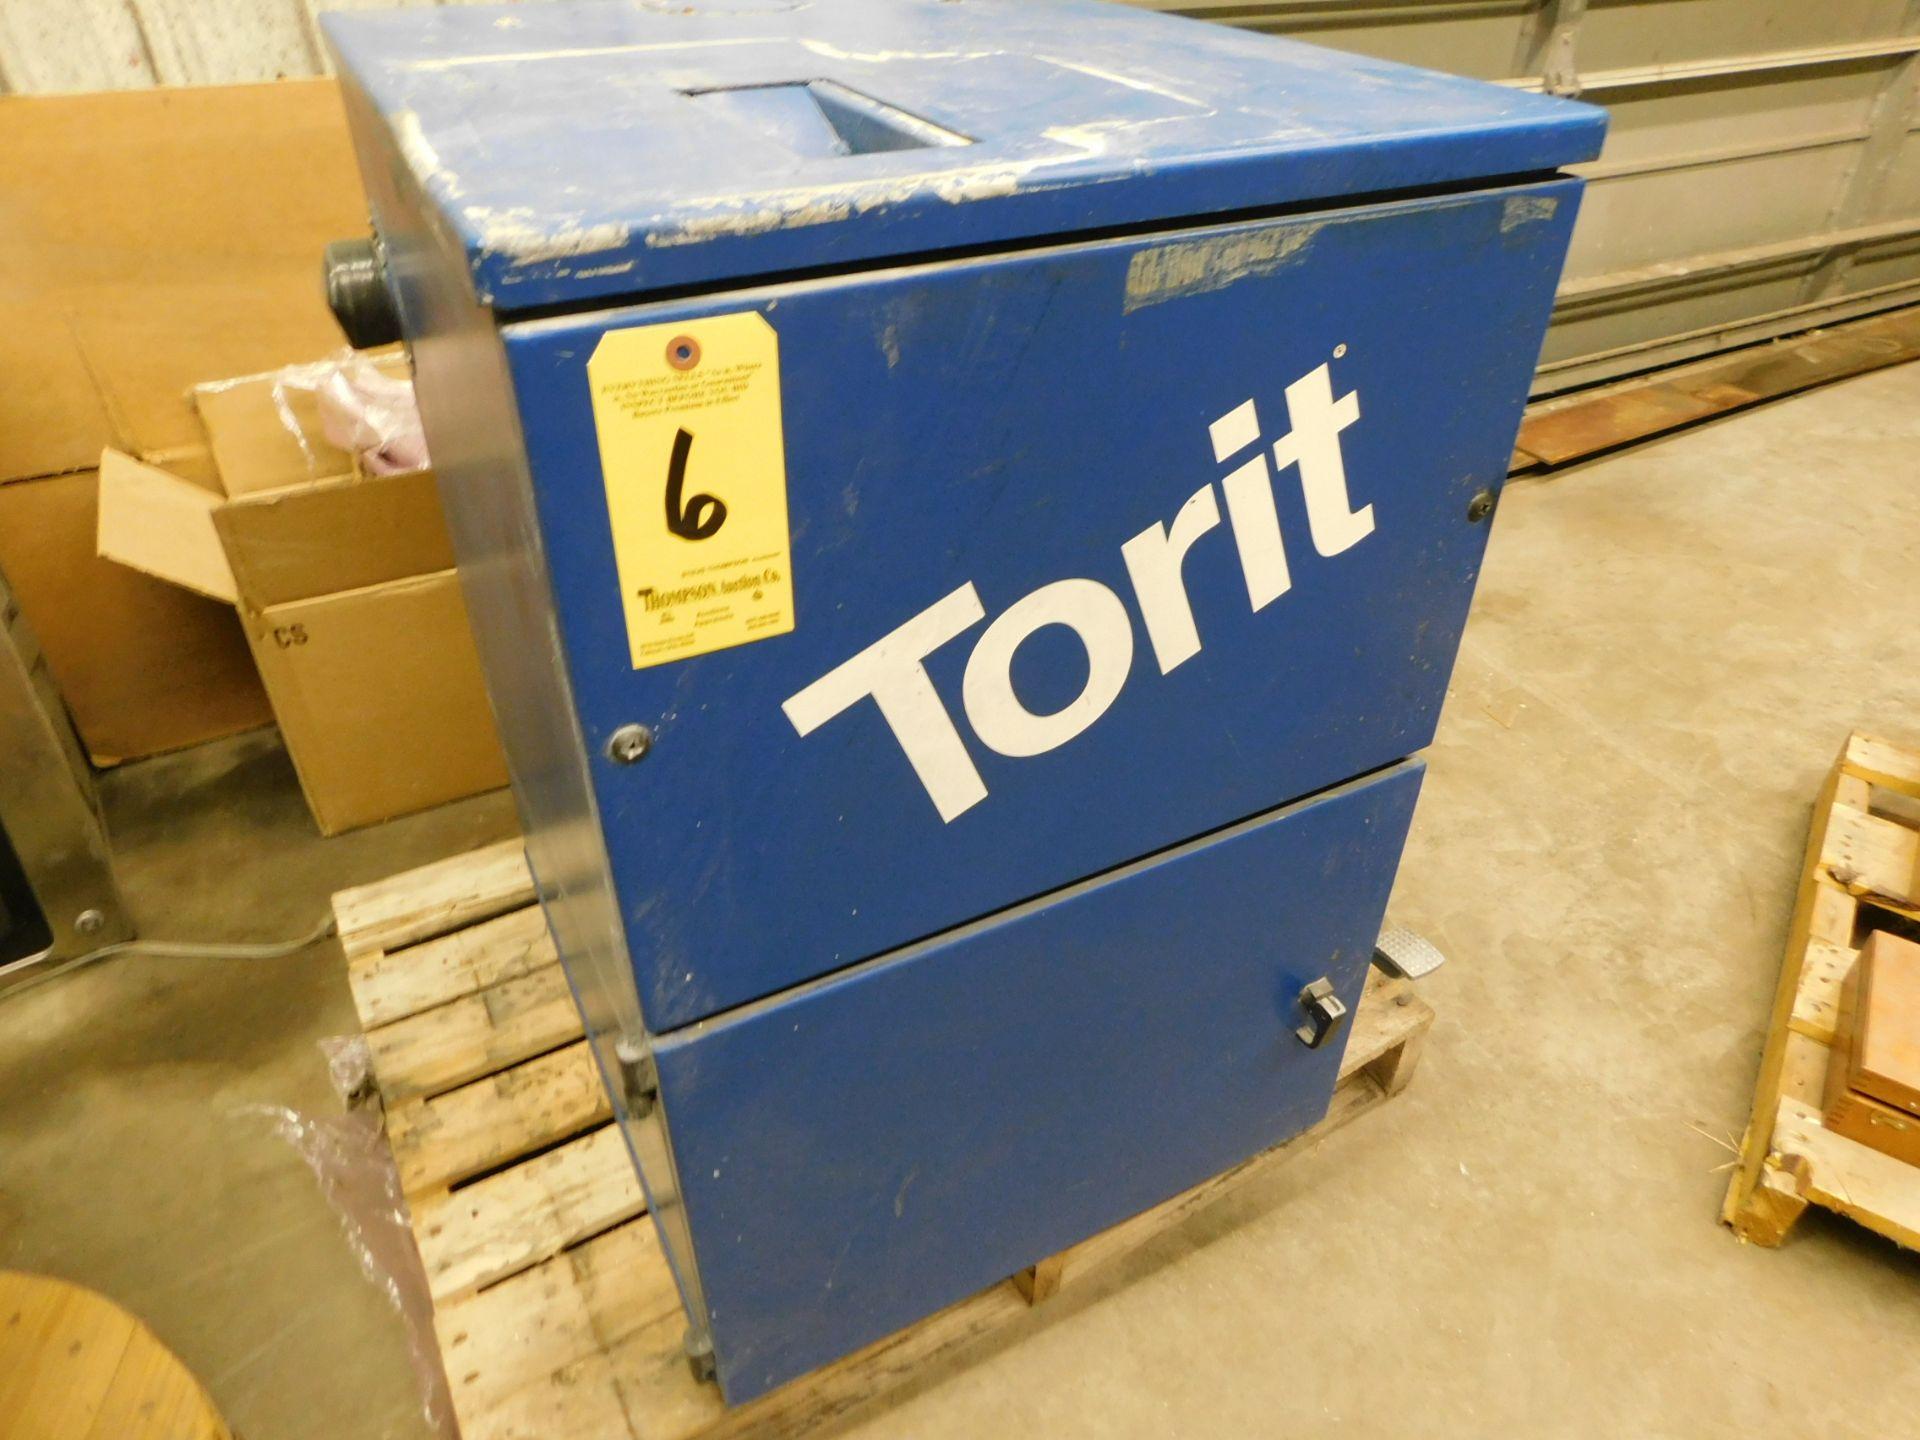 Lot 6 - Torit Model 60CAB Dust Collector, SN 1G705155, 115V, 1 phs., Lot Location: 301 Poor Dr., Warsaw, IN,